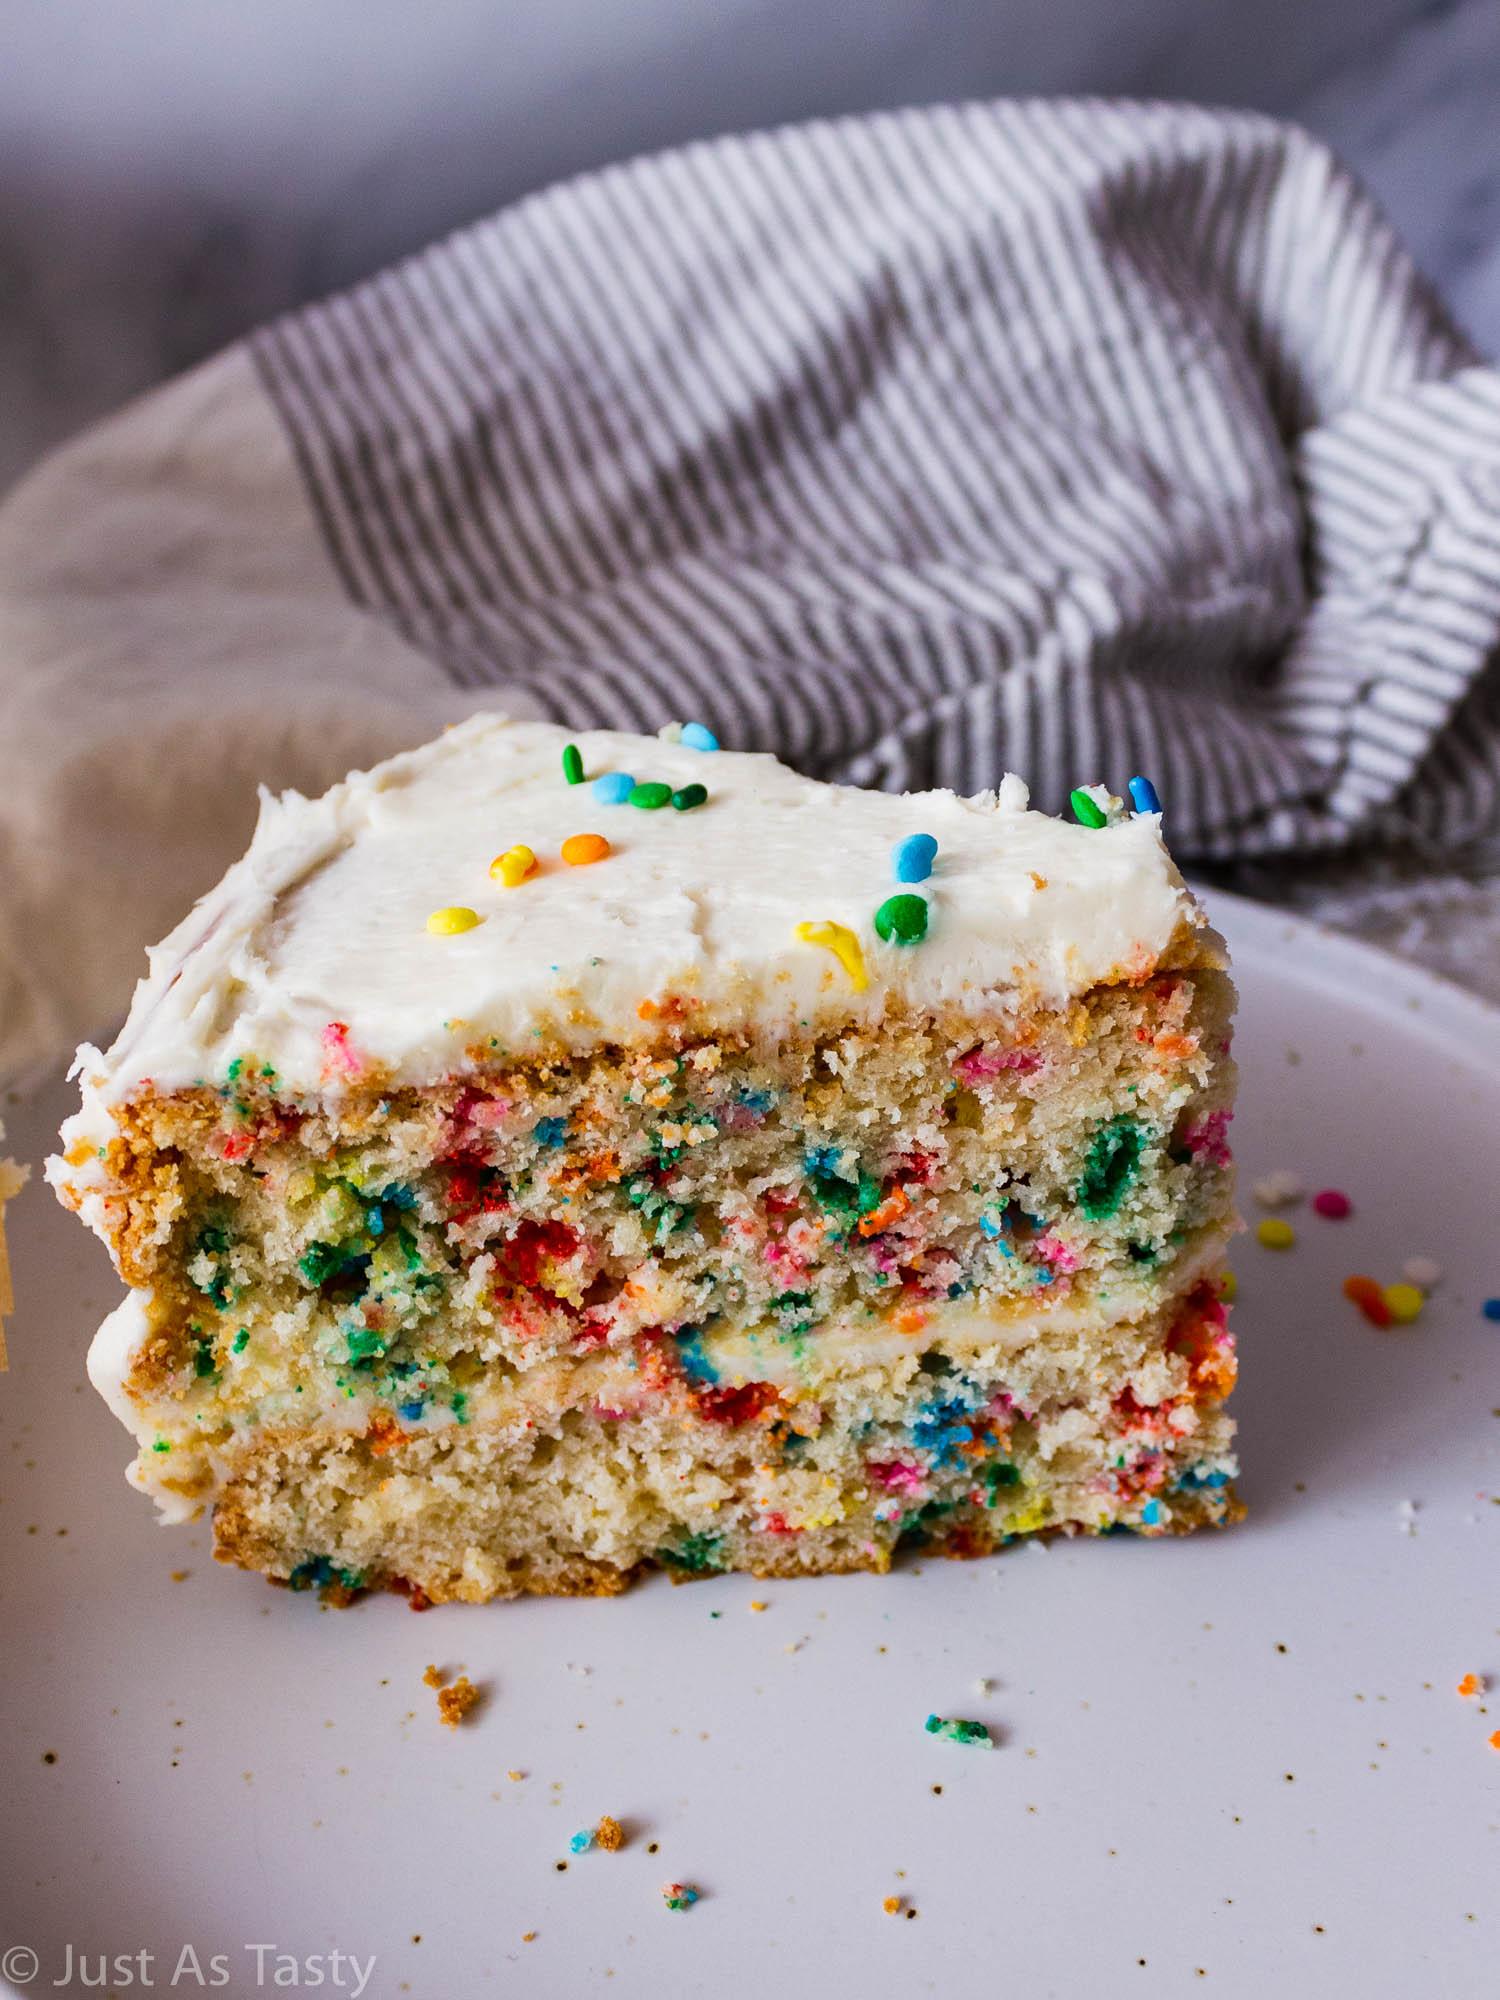 Slice of gluten free funfetti cake on a plate.